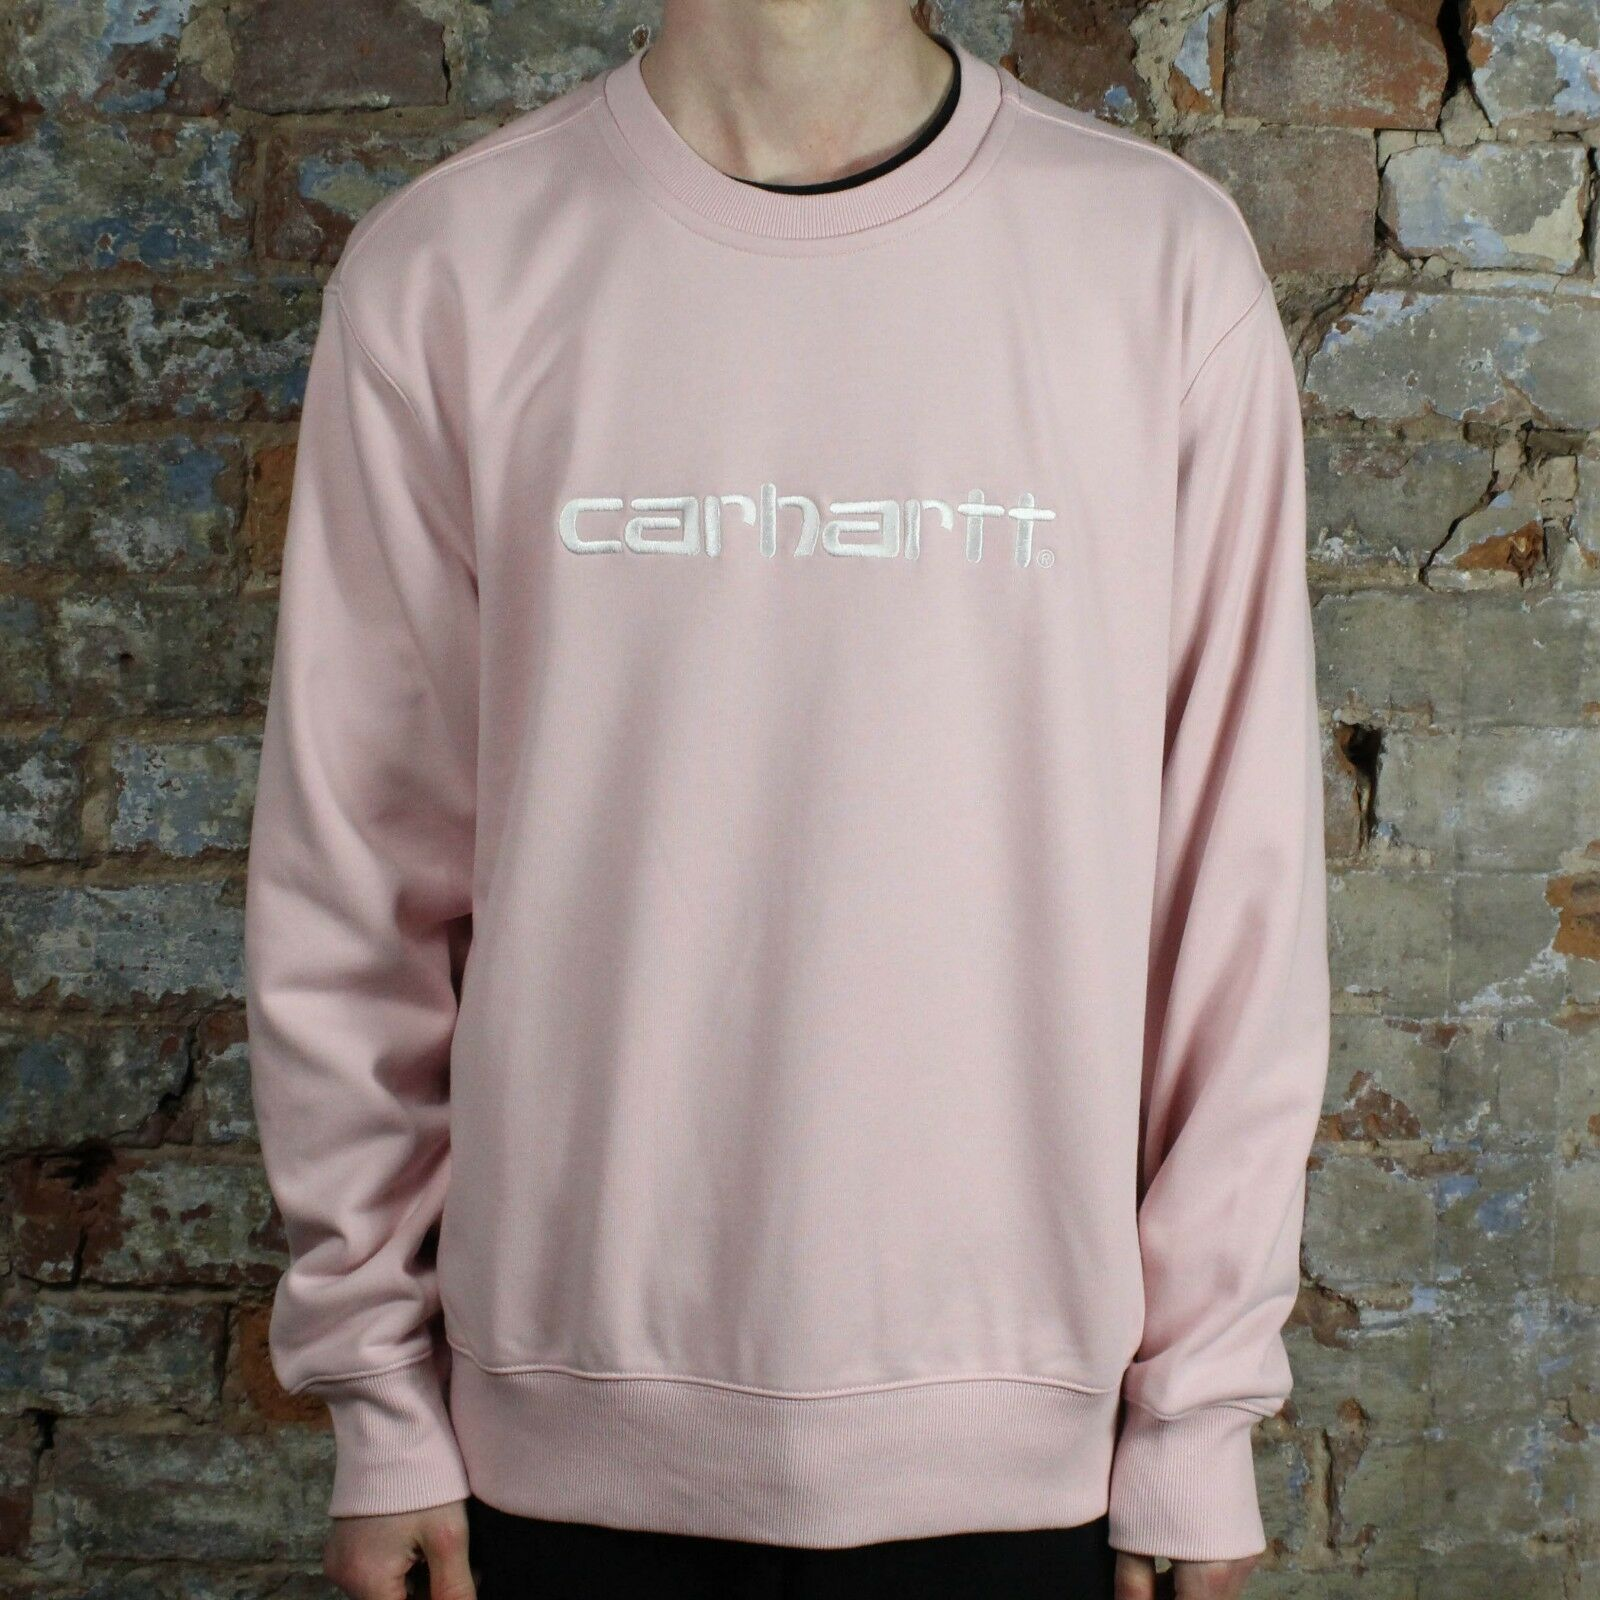 Carhartt Big Script Sweat – Dusty Rosa – in Größes M,L    | Flagship-Store